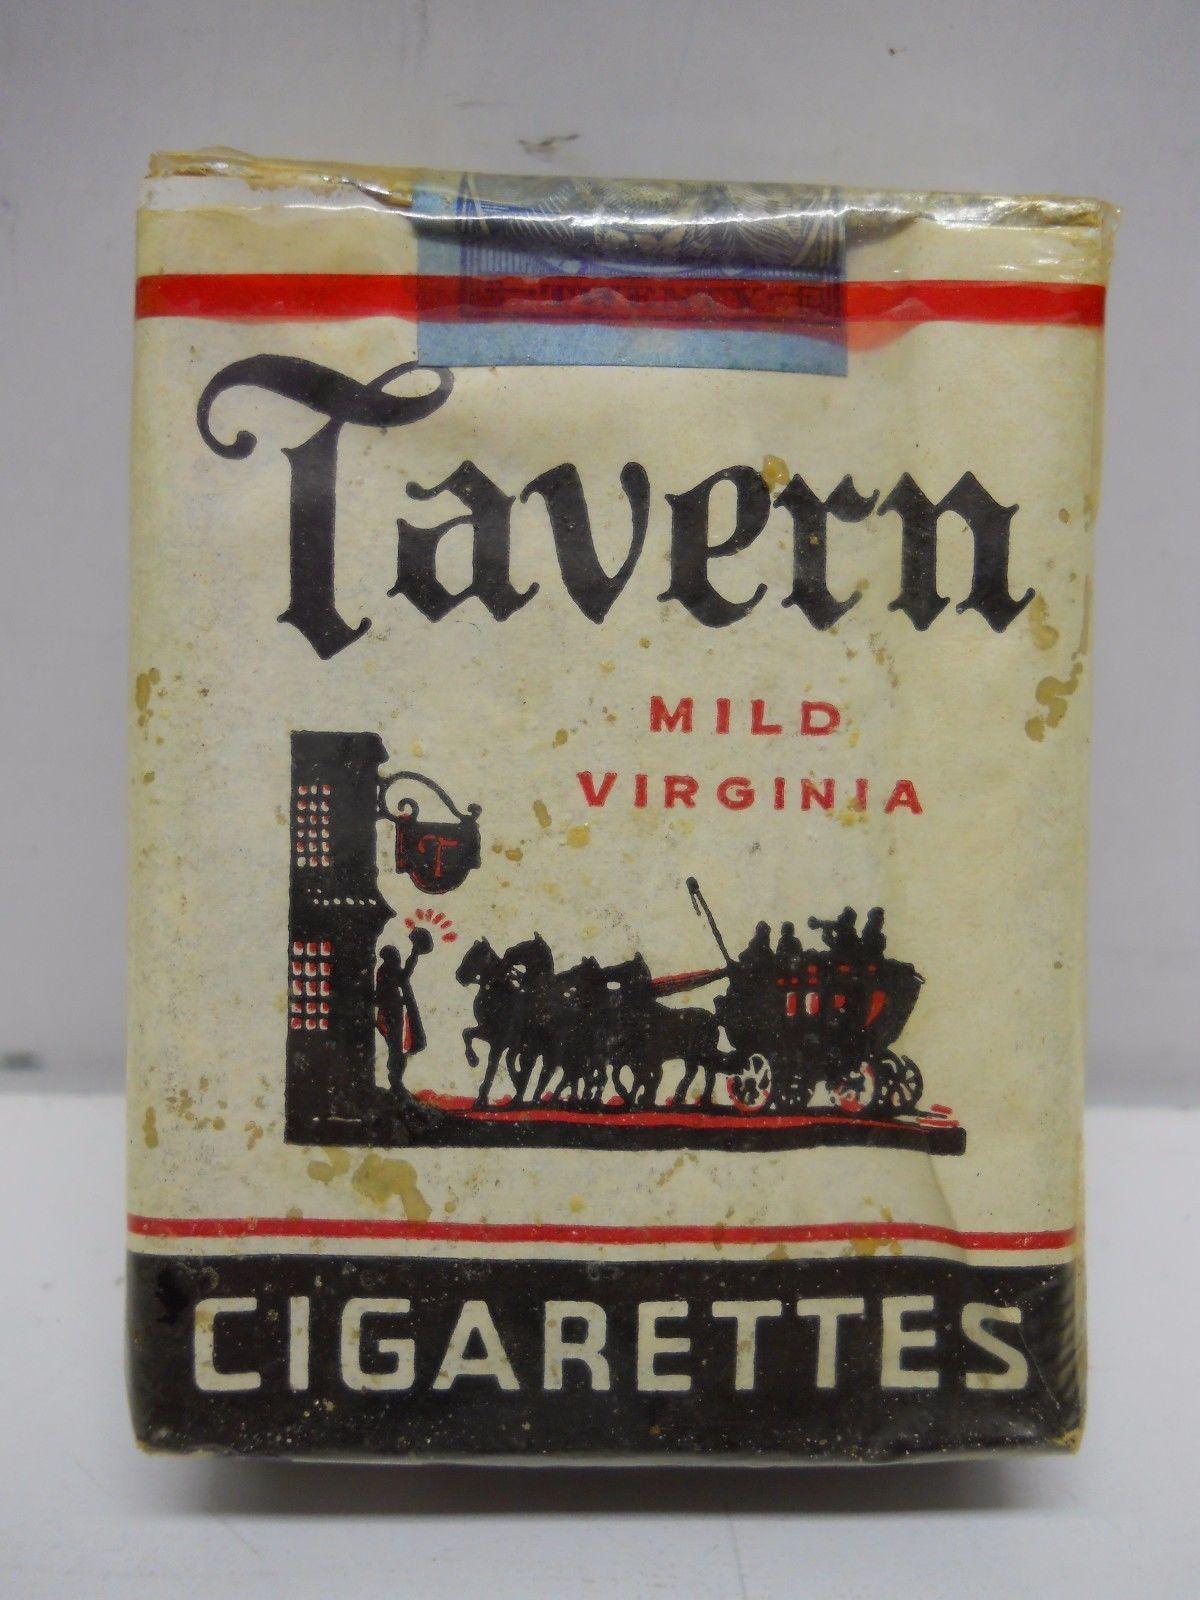 1950 Tavern Mild Virginia Cigarettes Pack Unopened Vintage Dunhill 20 Tobacco Ebay